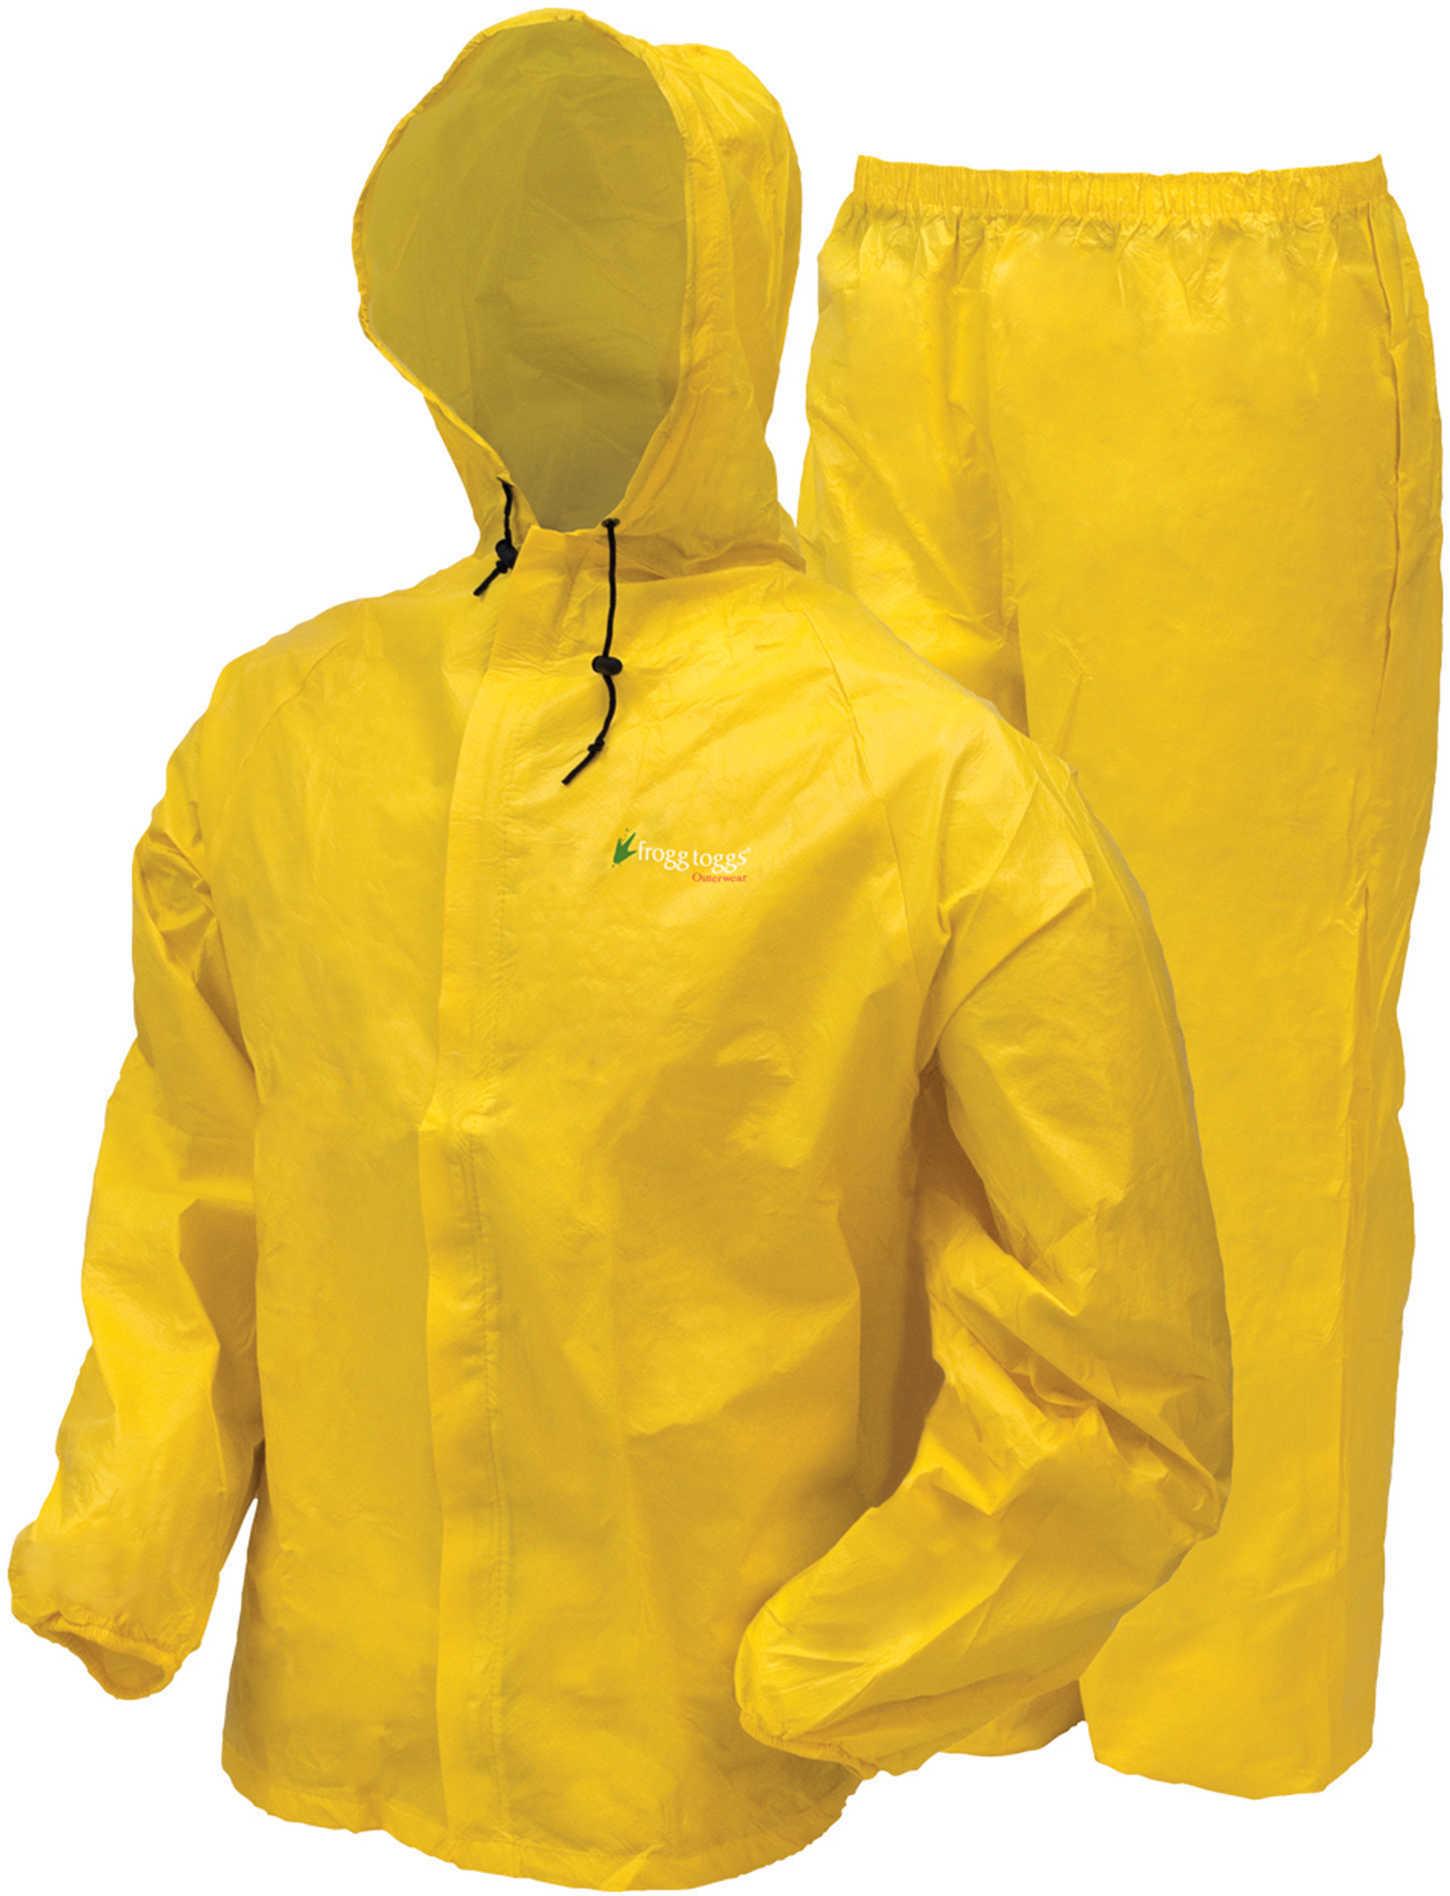 Ultra-Lite2 Rain Suit W/Stuff Sack Medium, Yellow Md: Ul12104-08Md